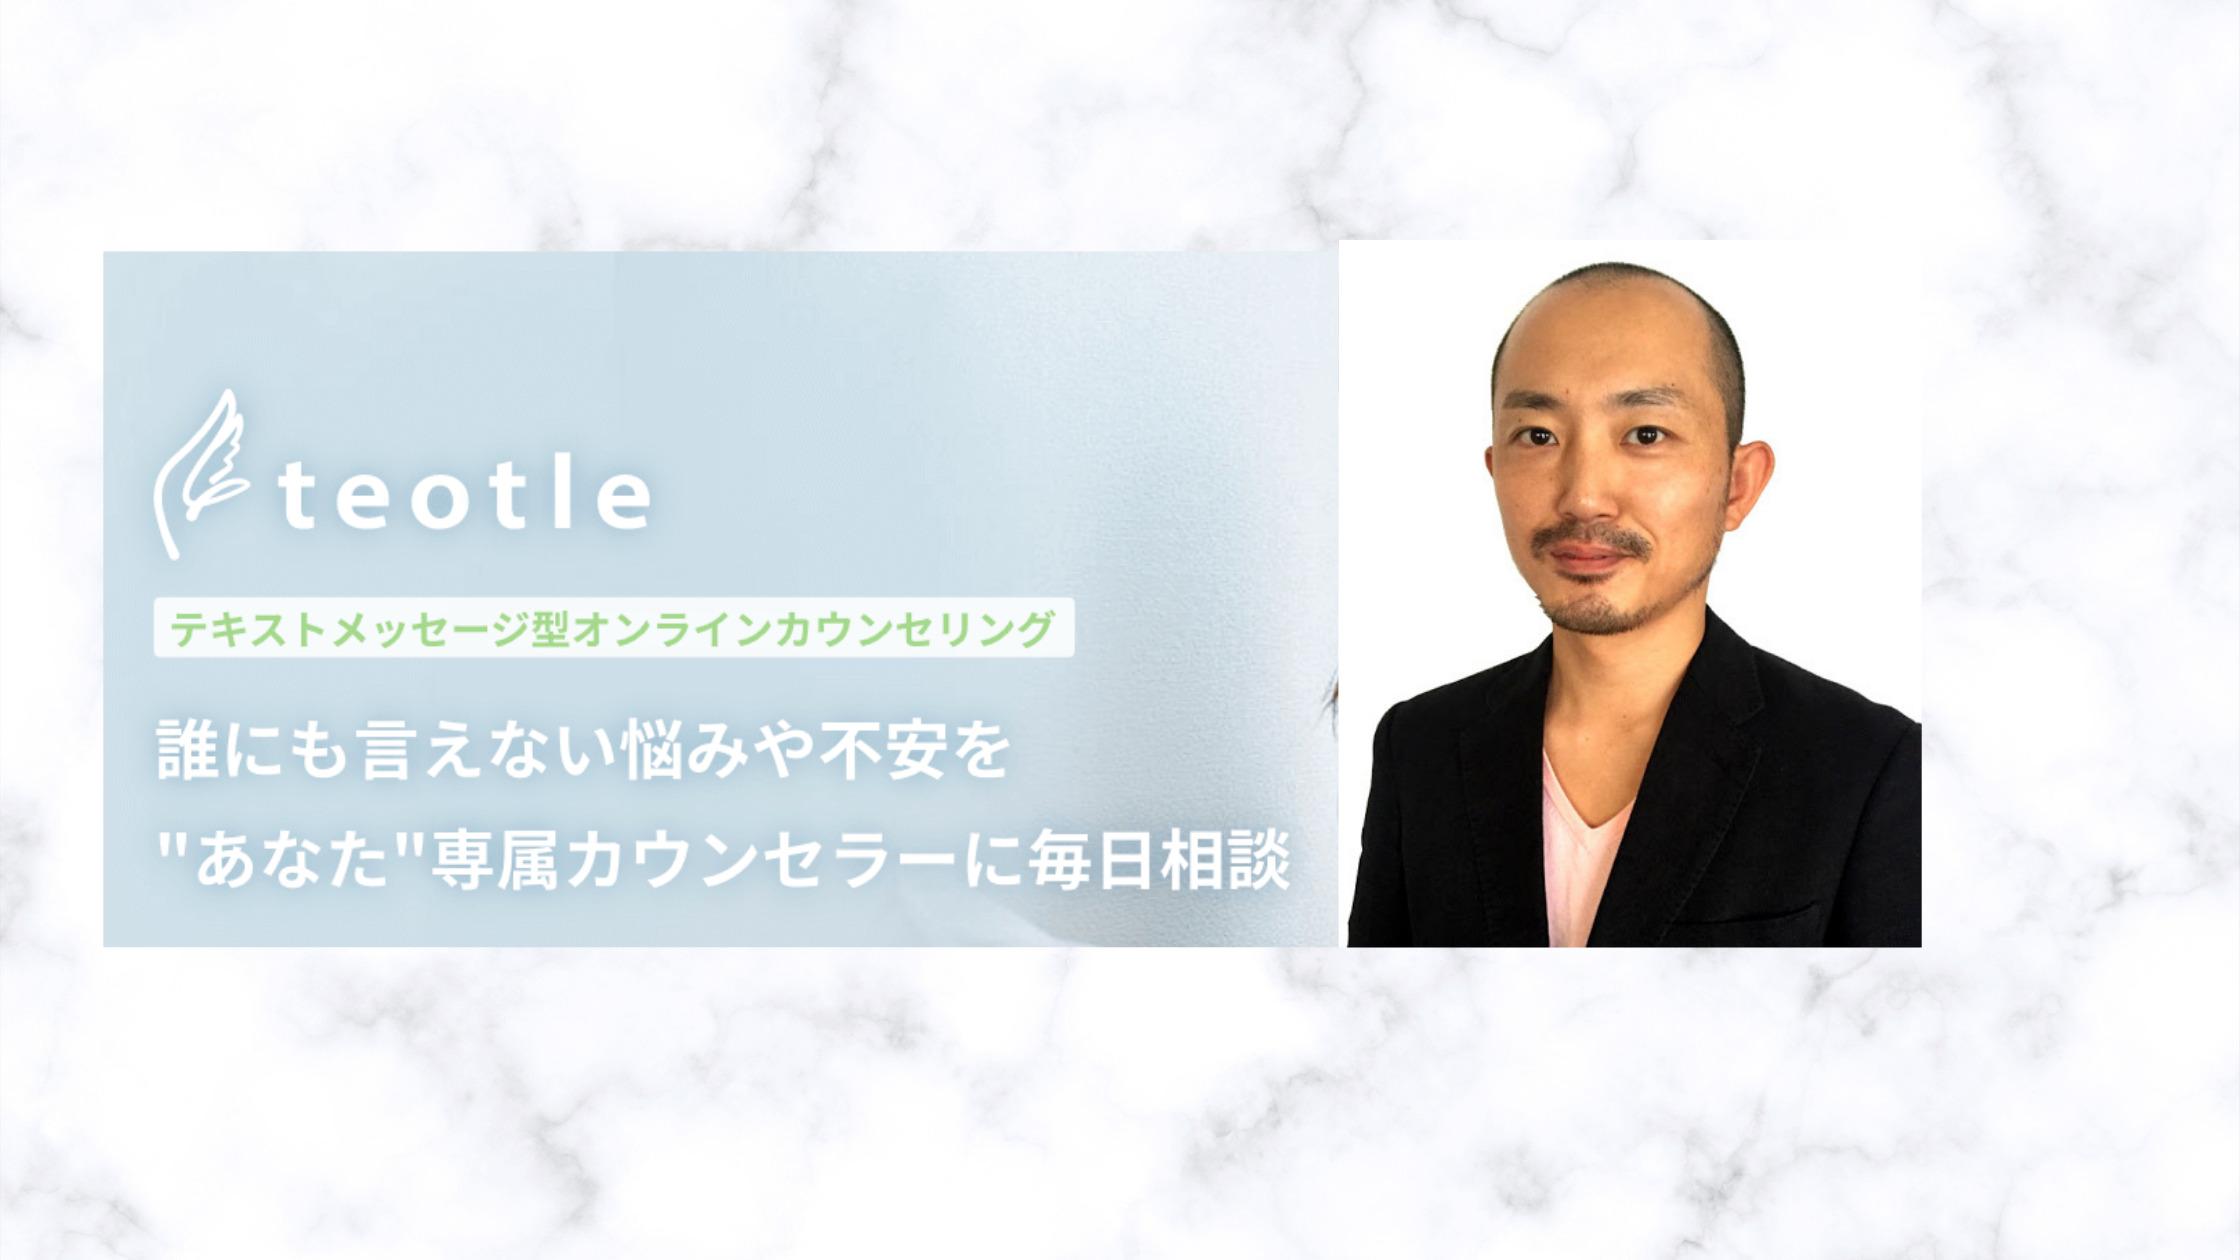 【teotle】上田 基先生のカウンセリングの口コミは?恋愛・結婚の悩みなら